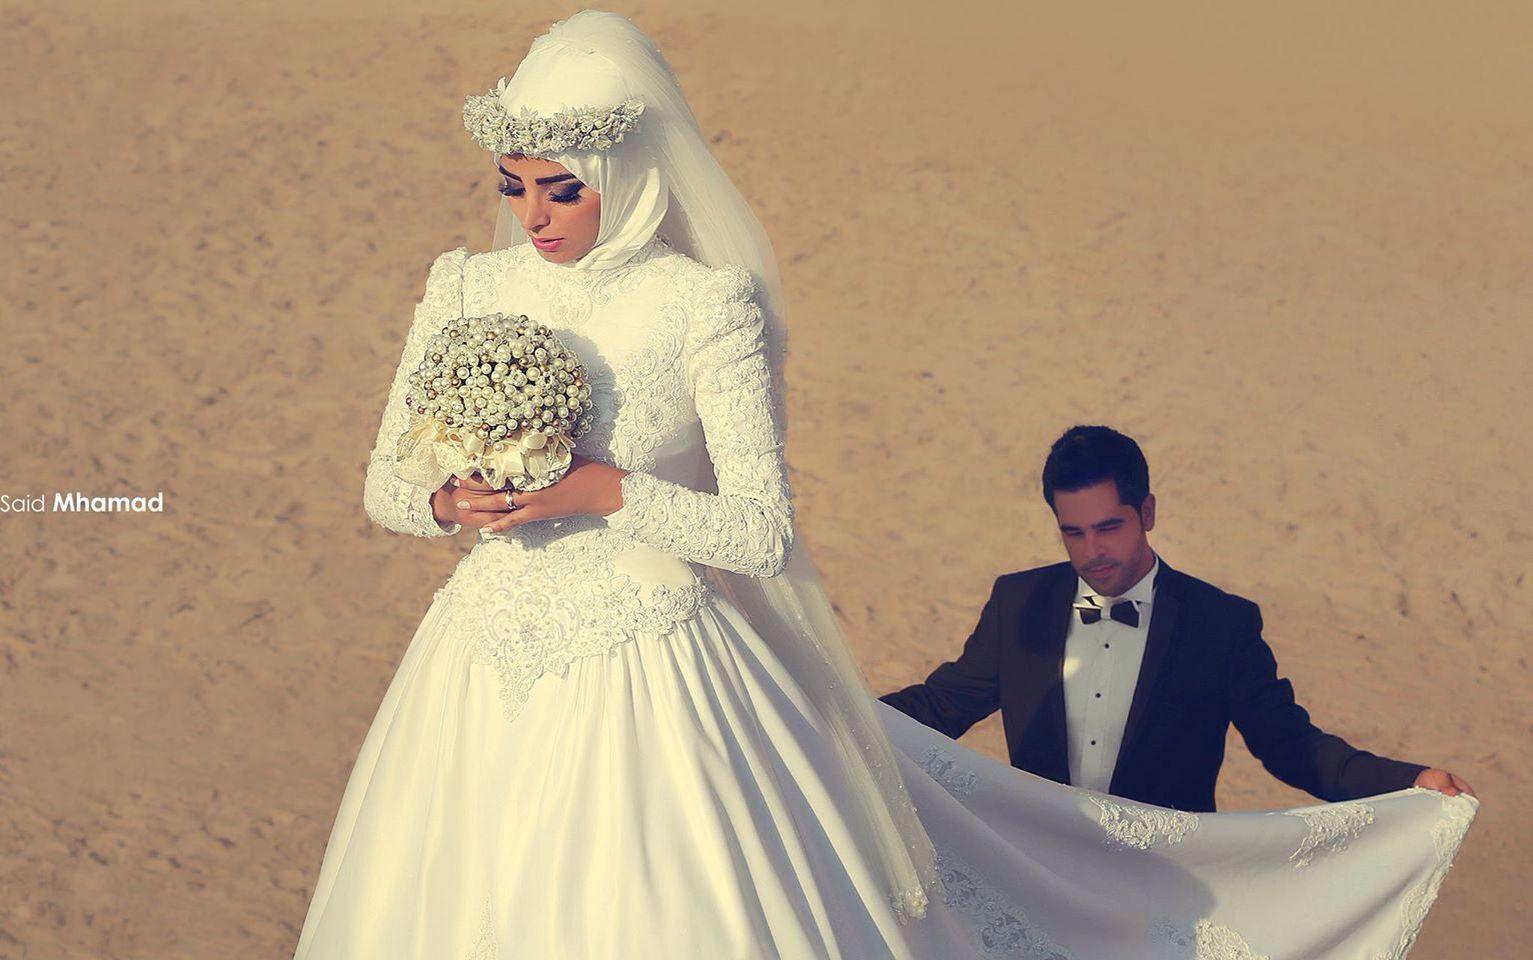 Muslim Bride Muslim Hijab Hijabibride Chichijab Muslim Wedding Dresses Muslim Wedding Dress Long Sleeve Wedding Dress Lace